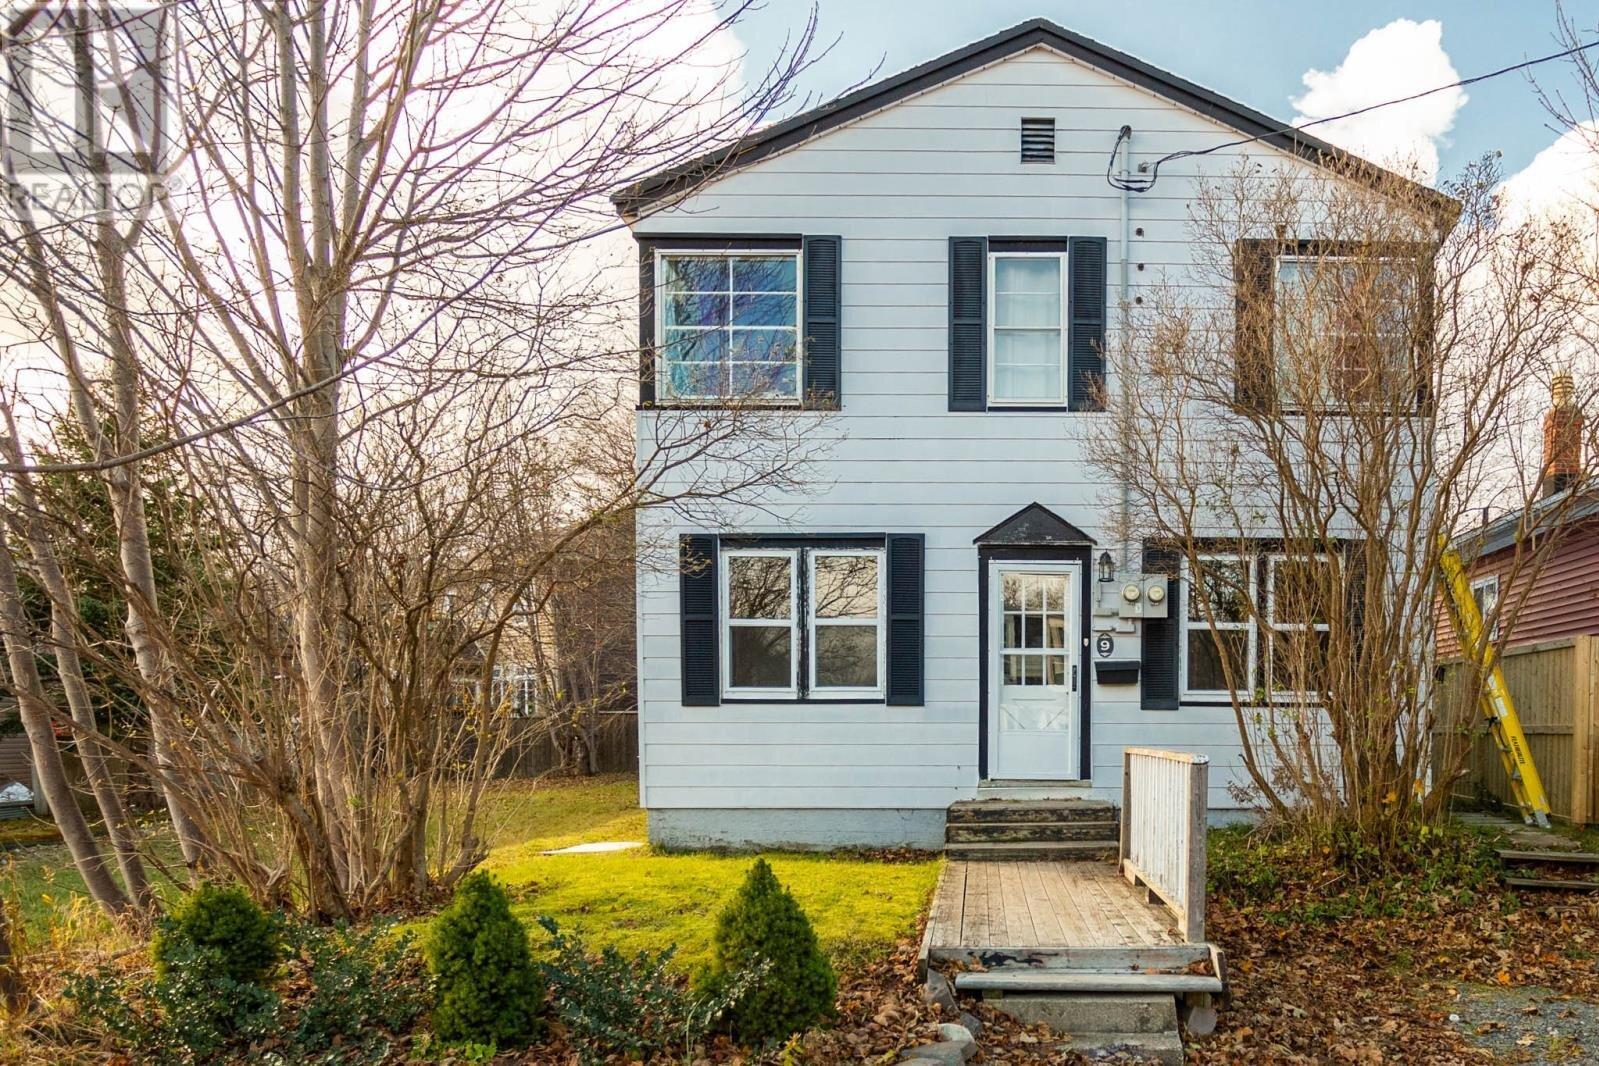 House for sale at 9 Allandale Rd St. John's Newfoundland - MLS: 1223629